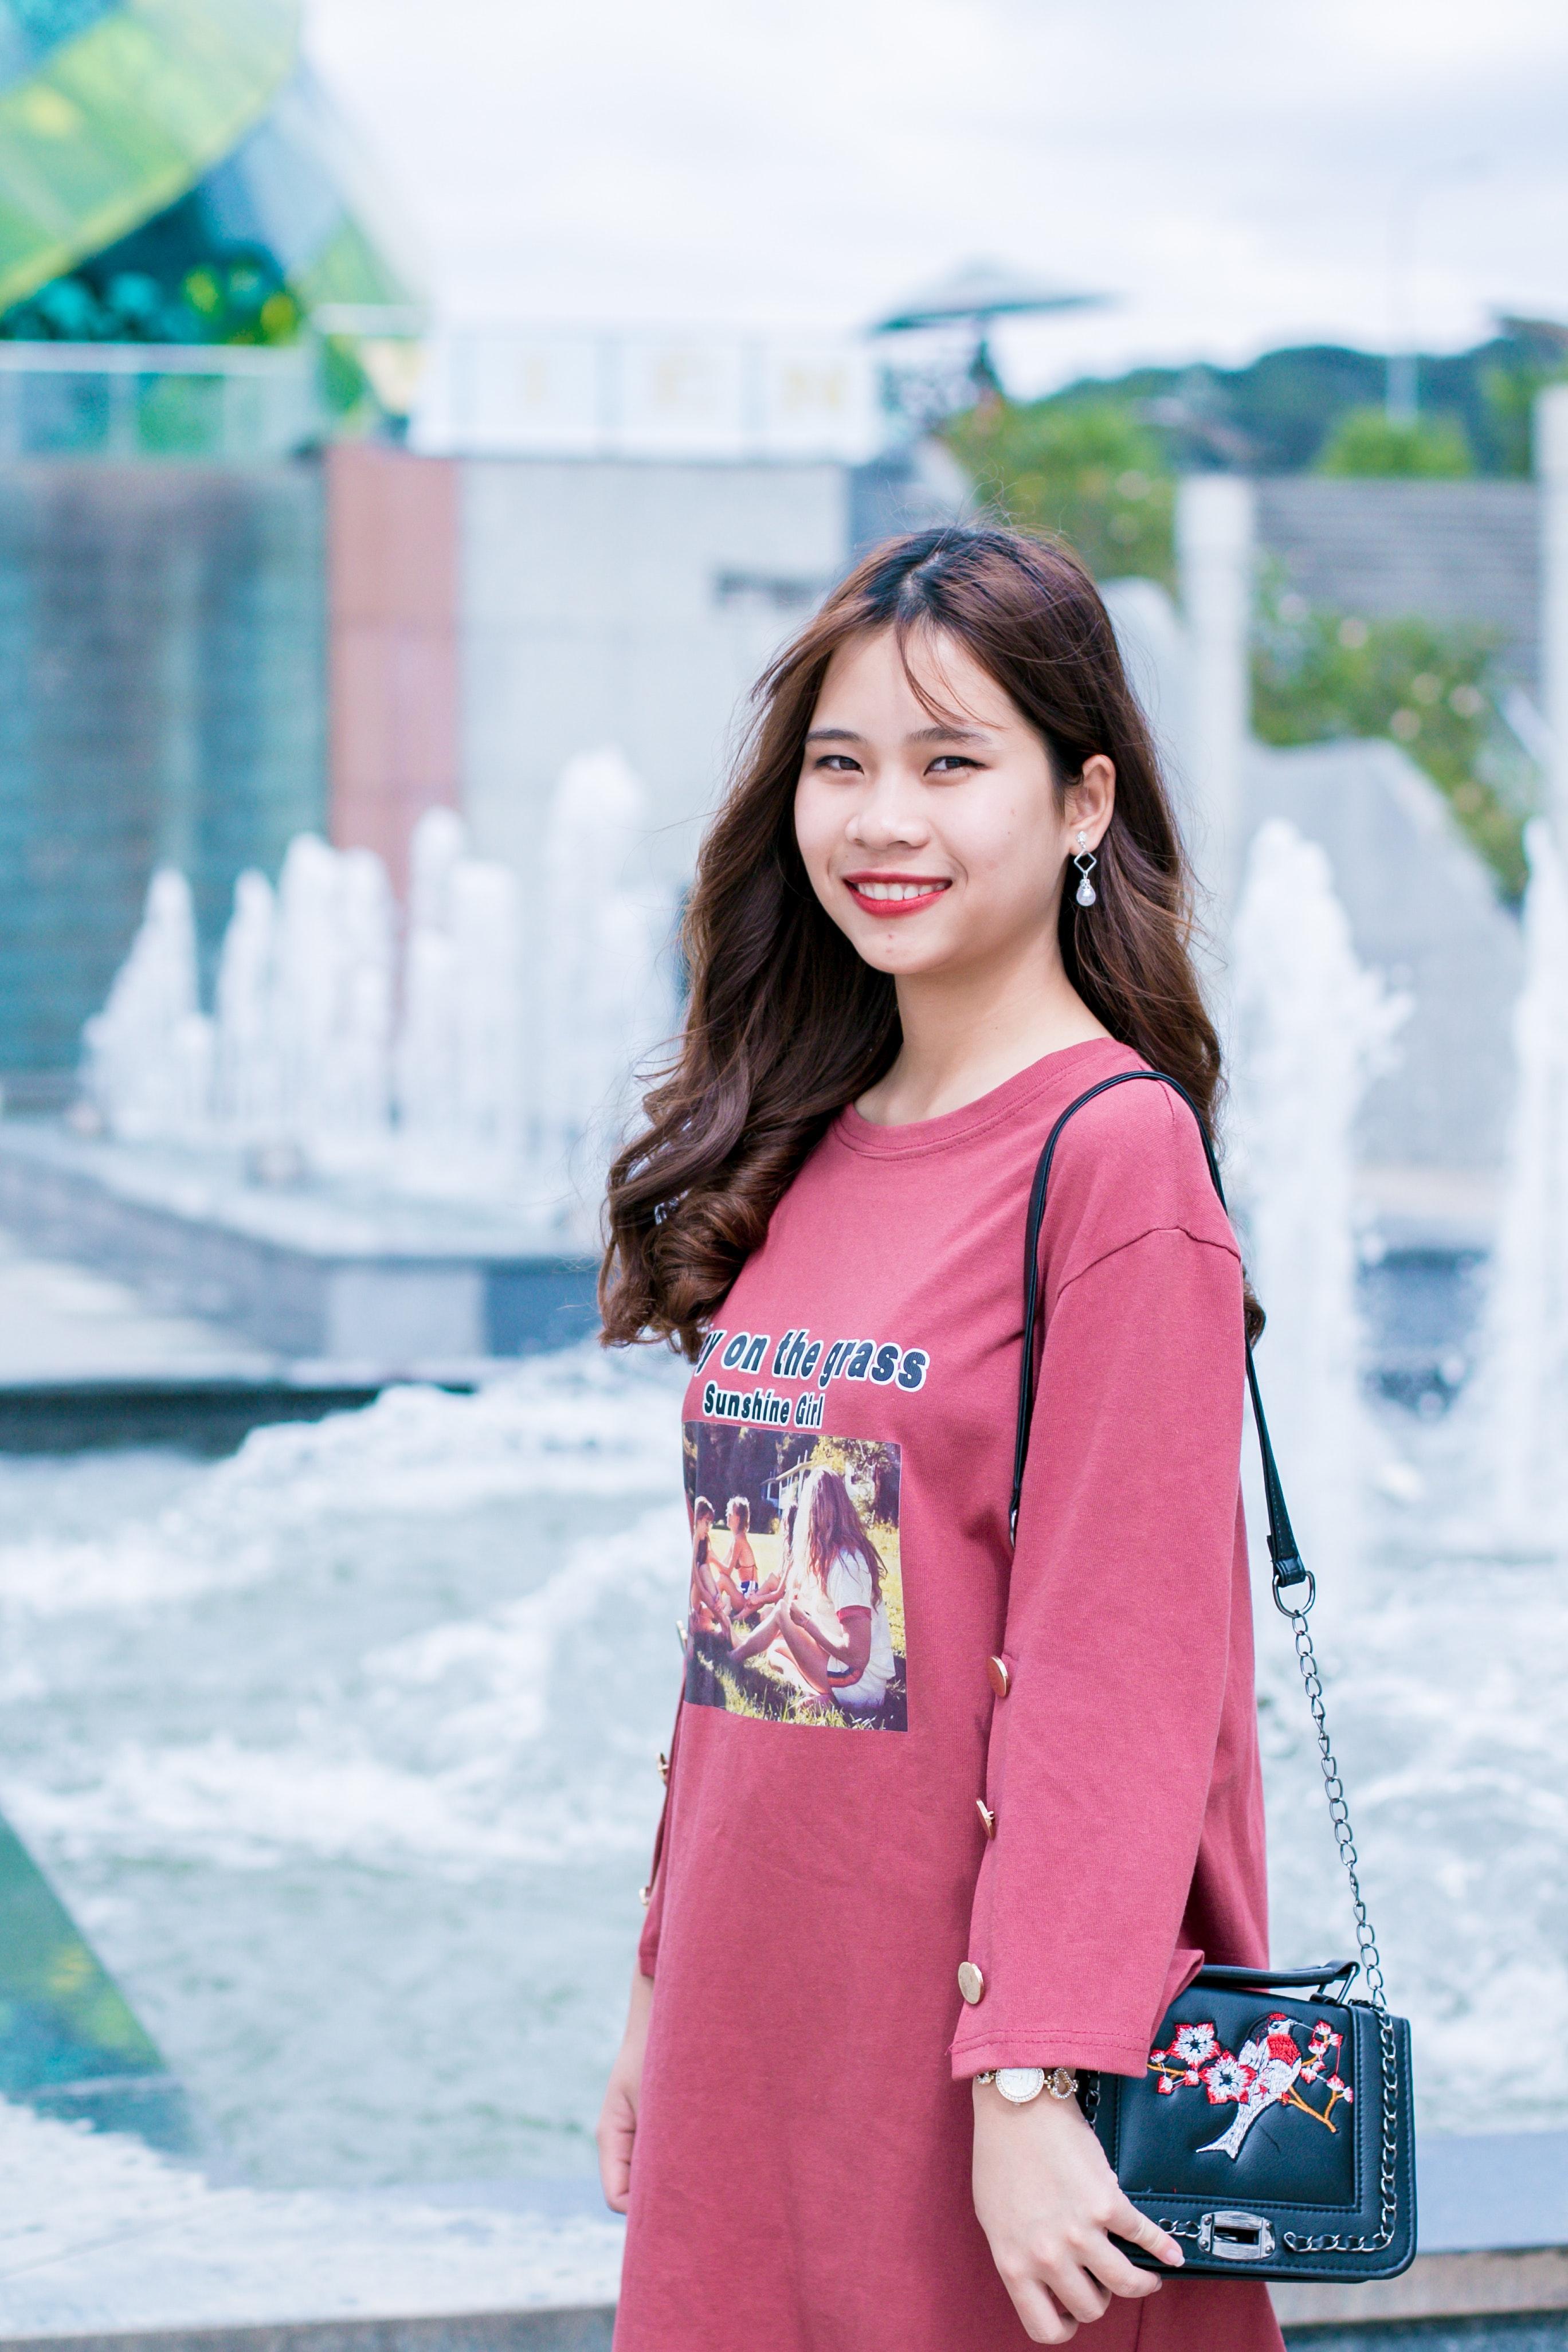 Free Images Adorable Adult Bag Beautiful Colorful Cute Daylight Dress Enjoyment Fashion Female Focus Fountain Fun Girl Joy Leisure Model